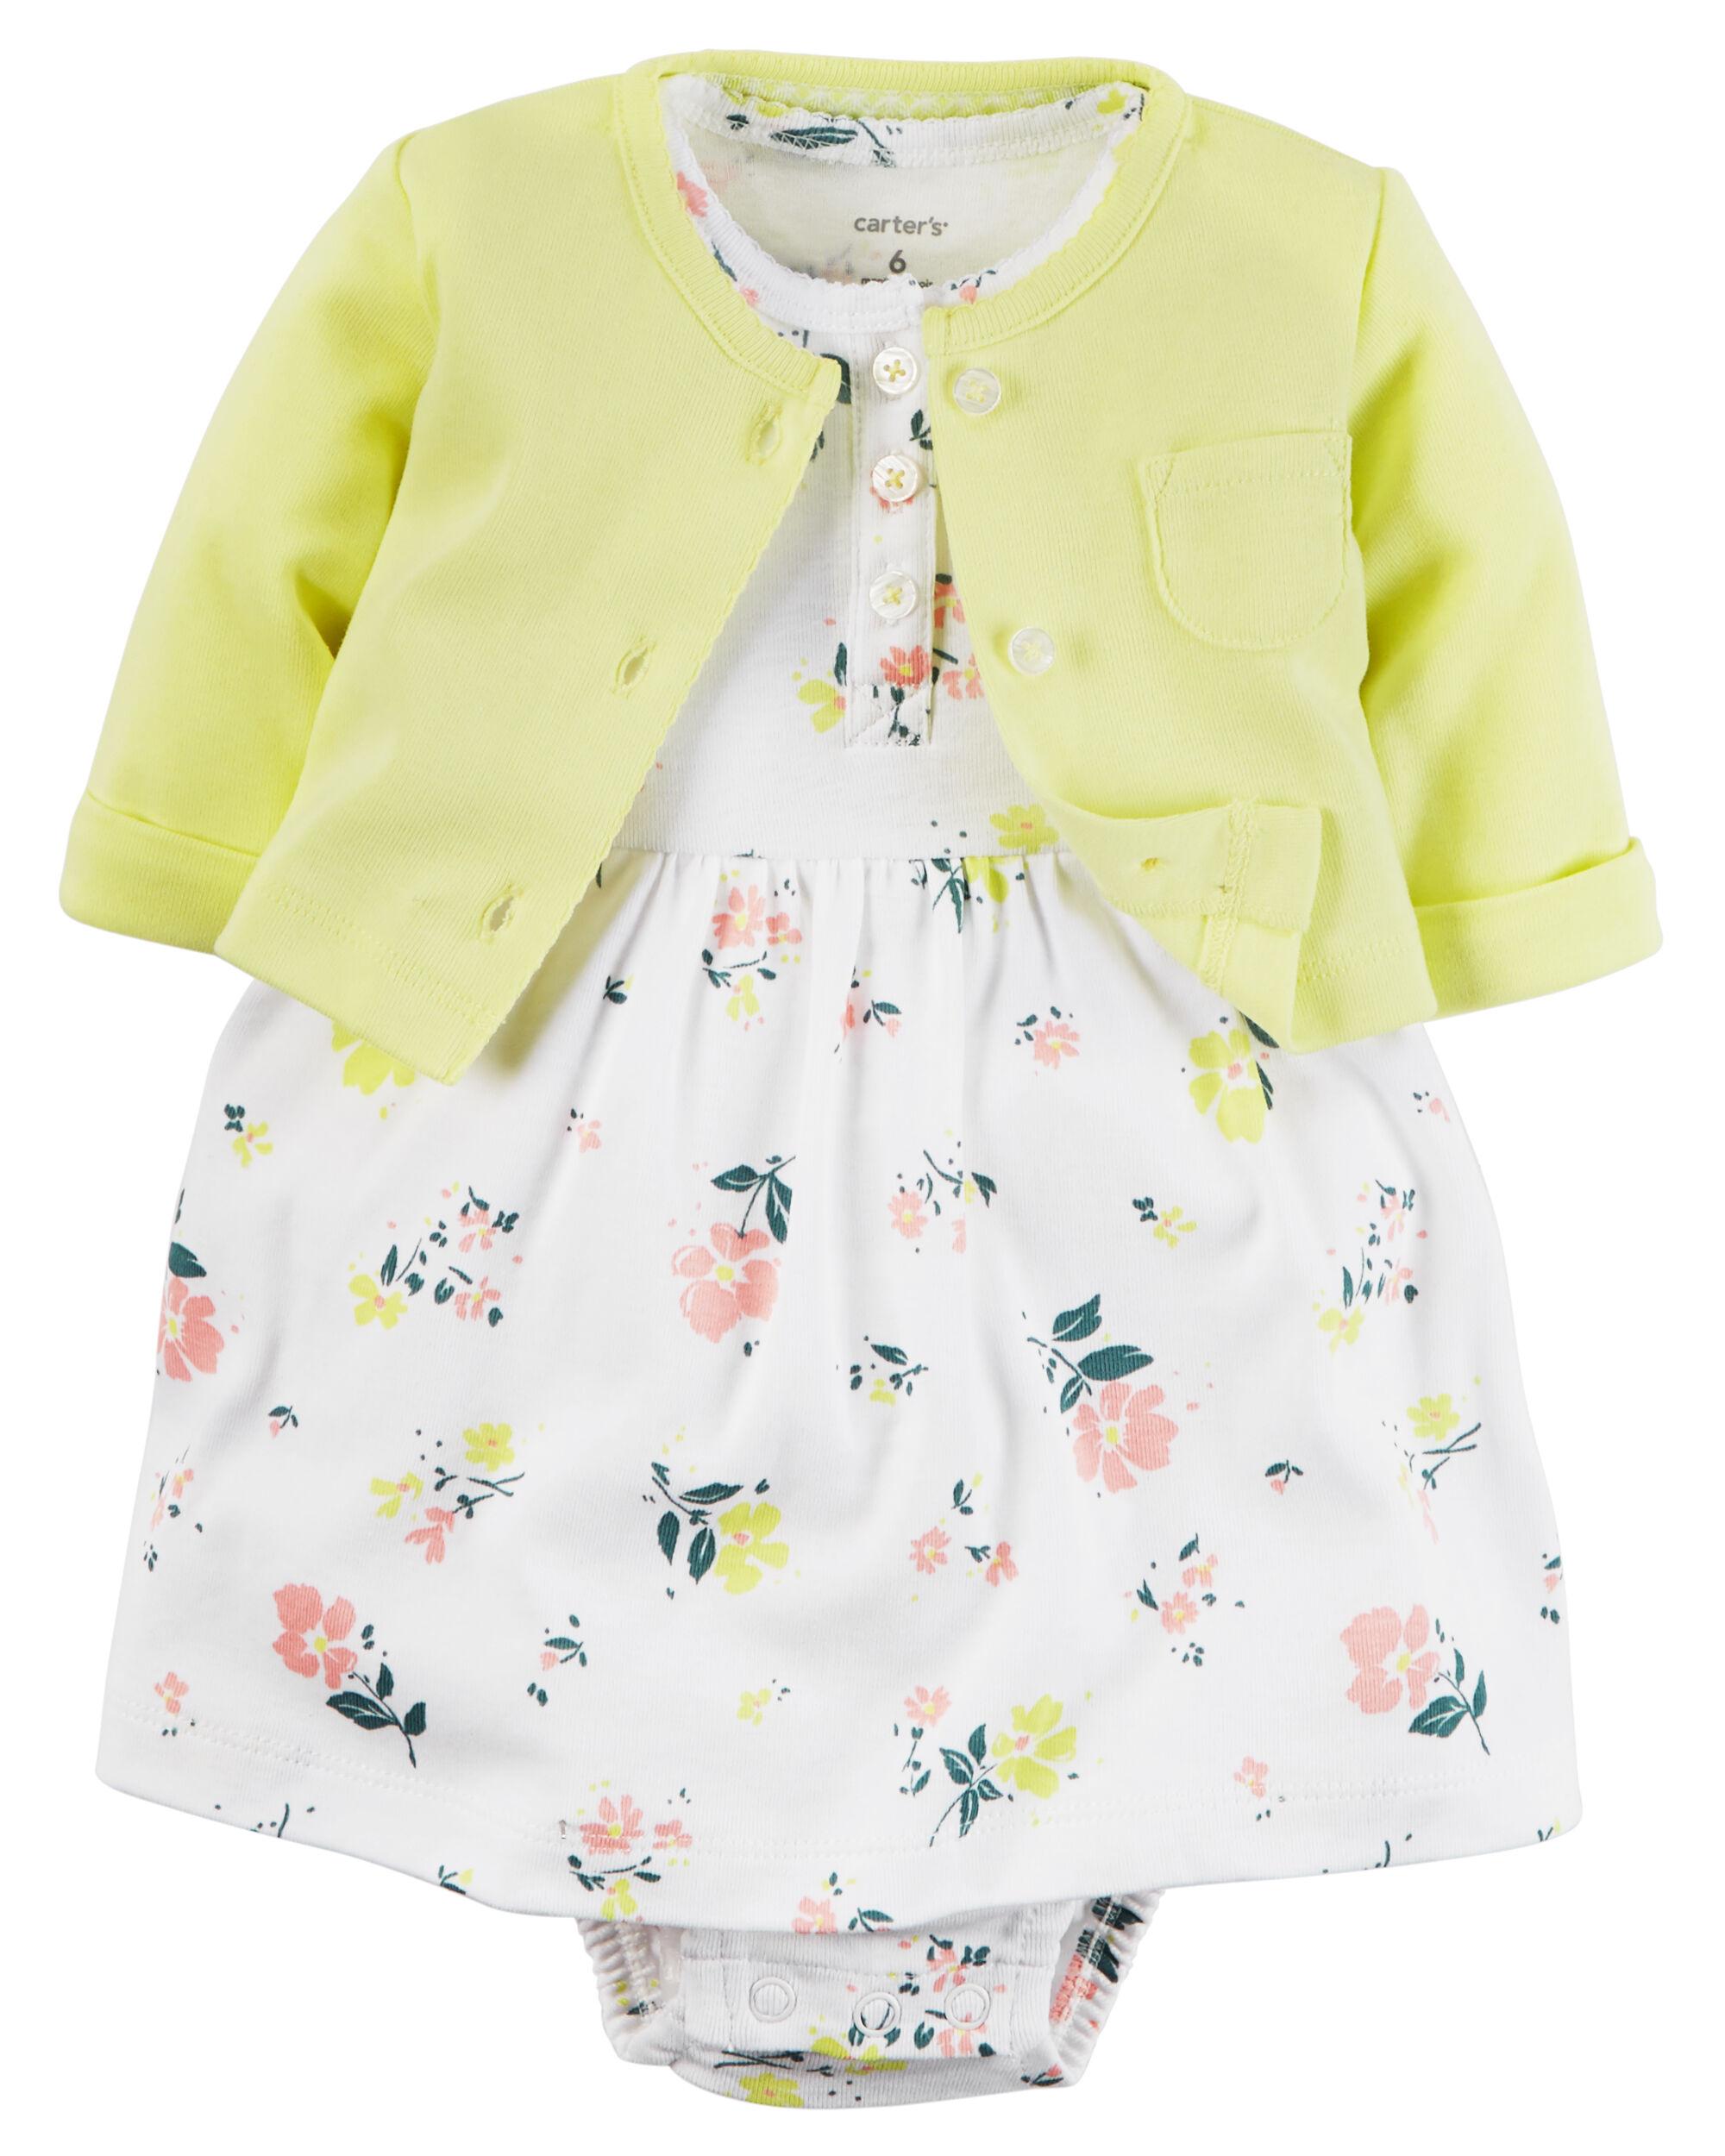 2-Piece Babysoft Bodysuit Dress u0026 Cardigan ...  sc 1 st  Carteru0027s & 2-Piece Babysoft Bodysuit Dress u0026 Cardigan Set | Carters.com